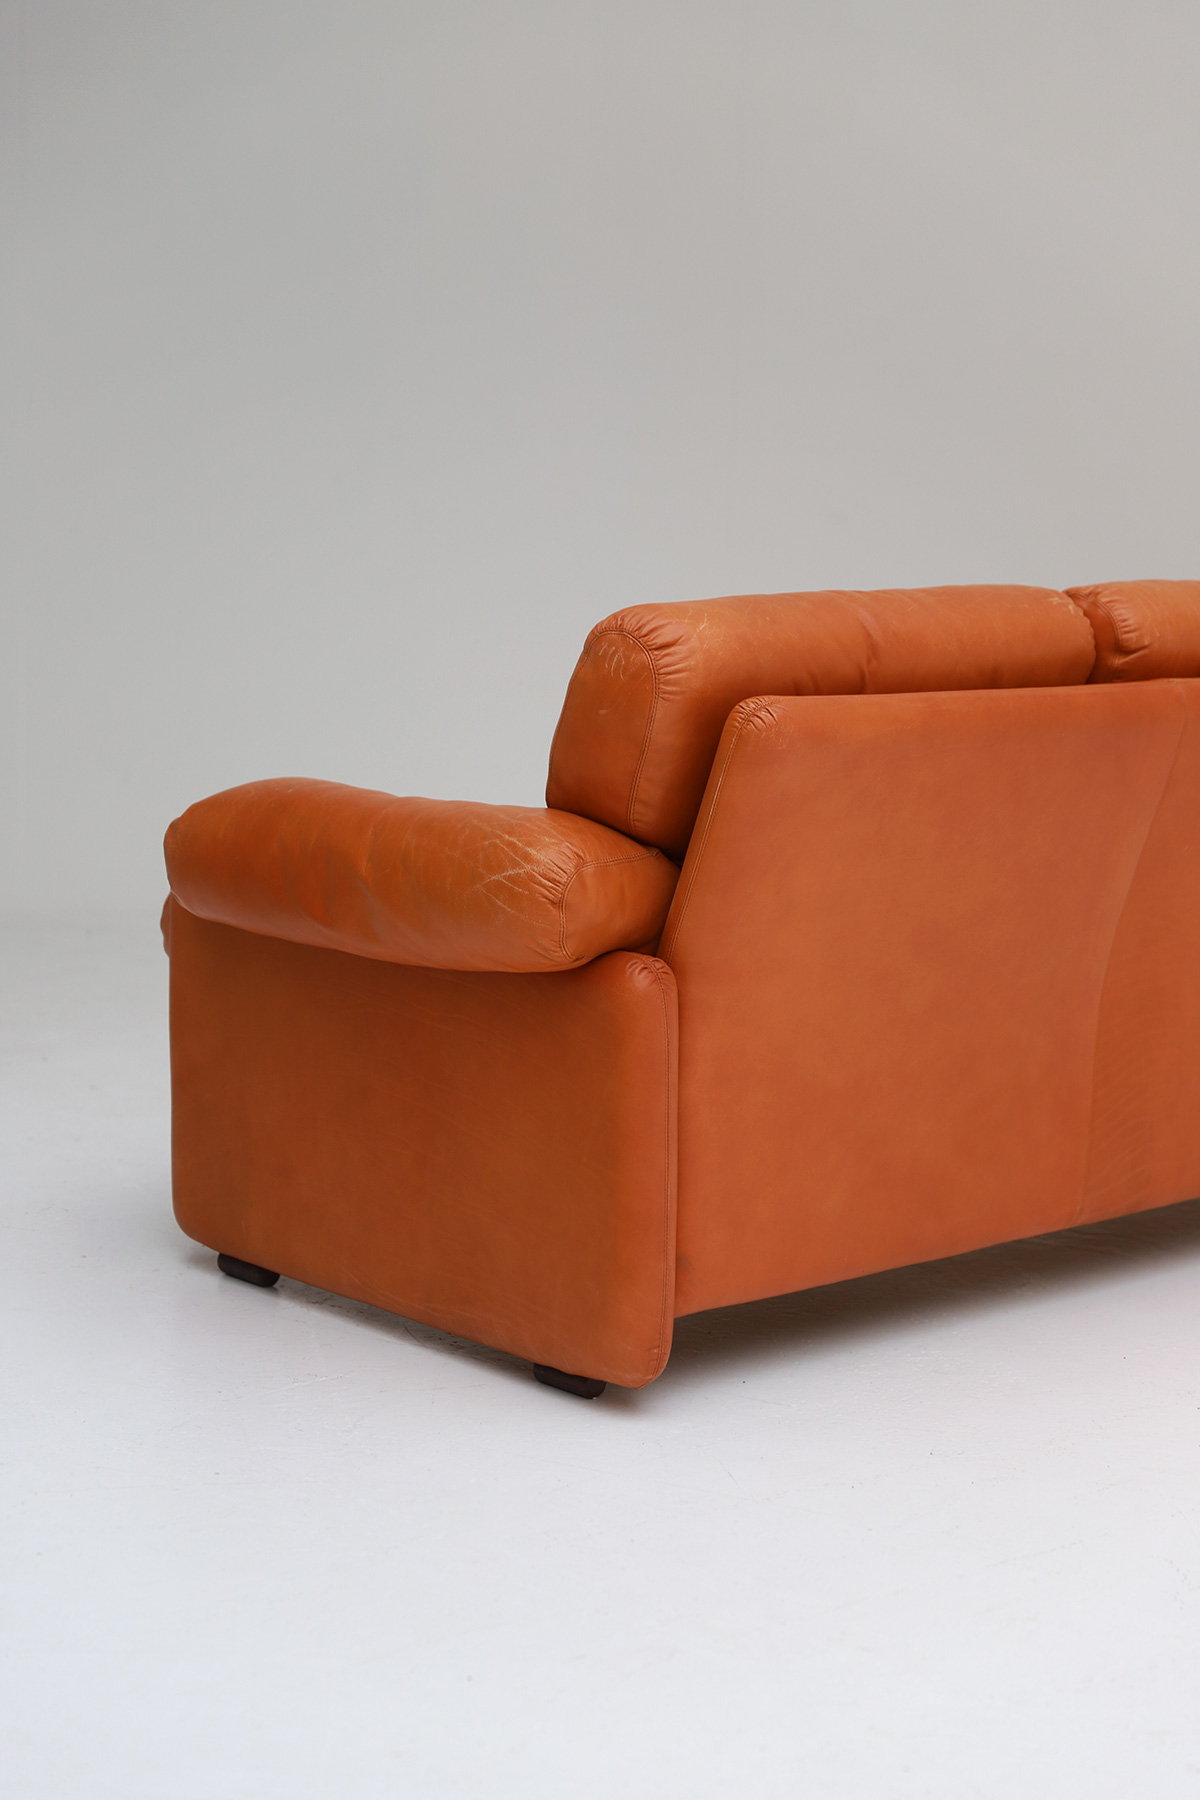 Tobia Scarpa 4 seat Cognac Leather Sofa B&B Italiaimage 7